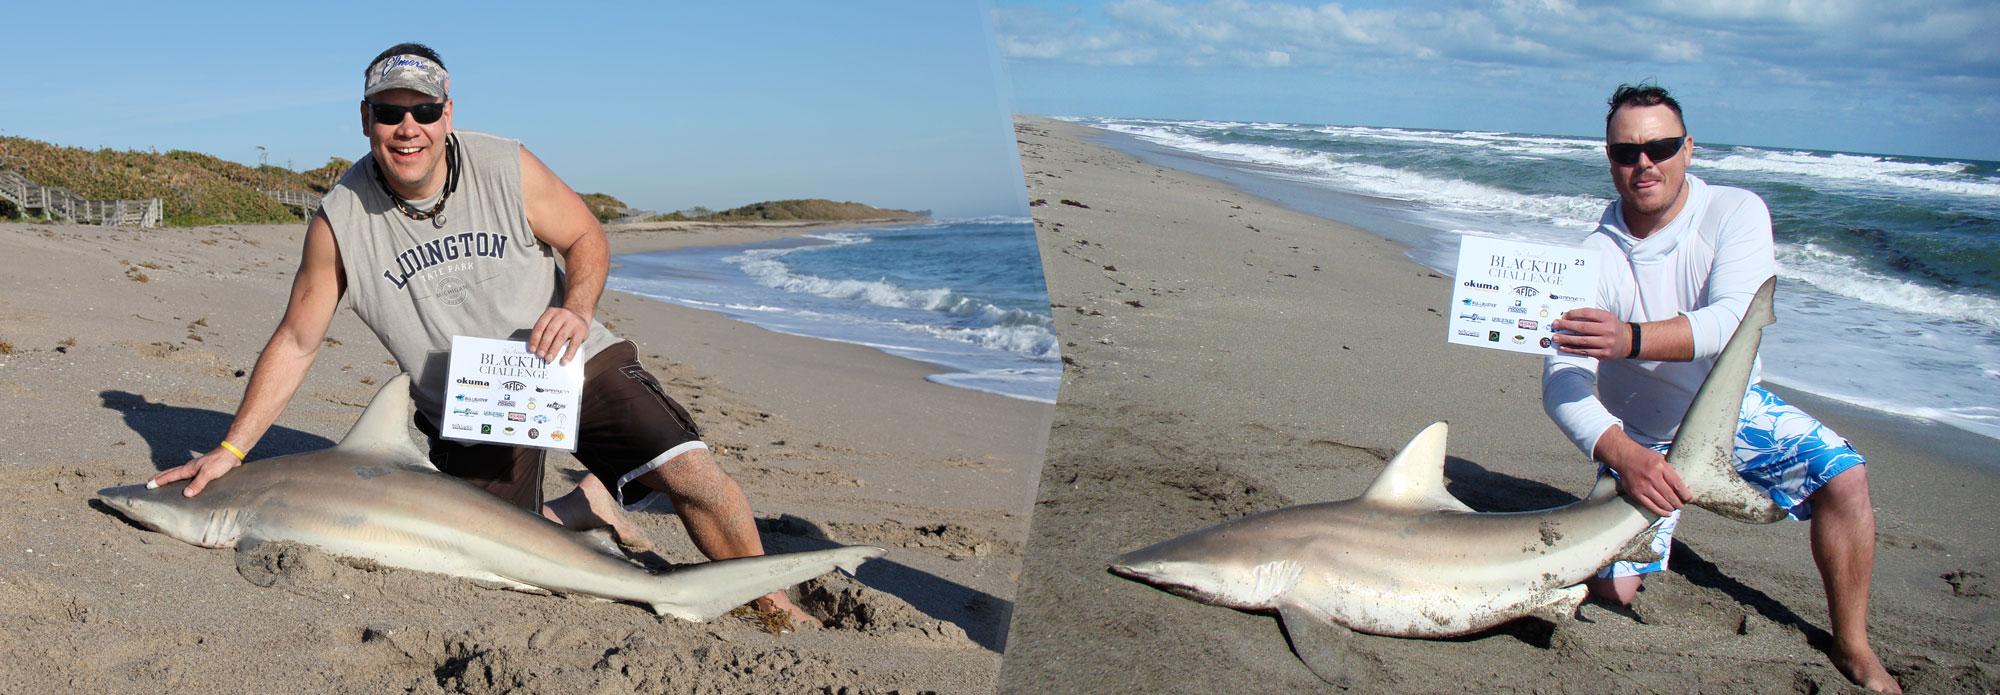 Blacktip shark caught in the Blacktip Challenge shark fishing tournament